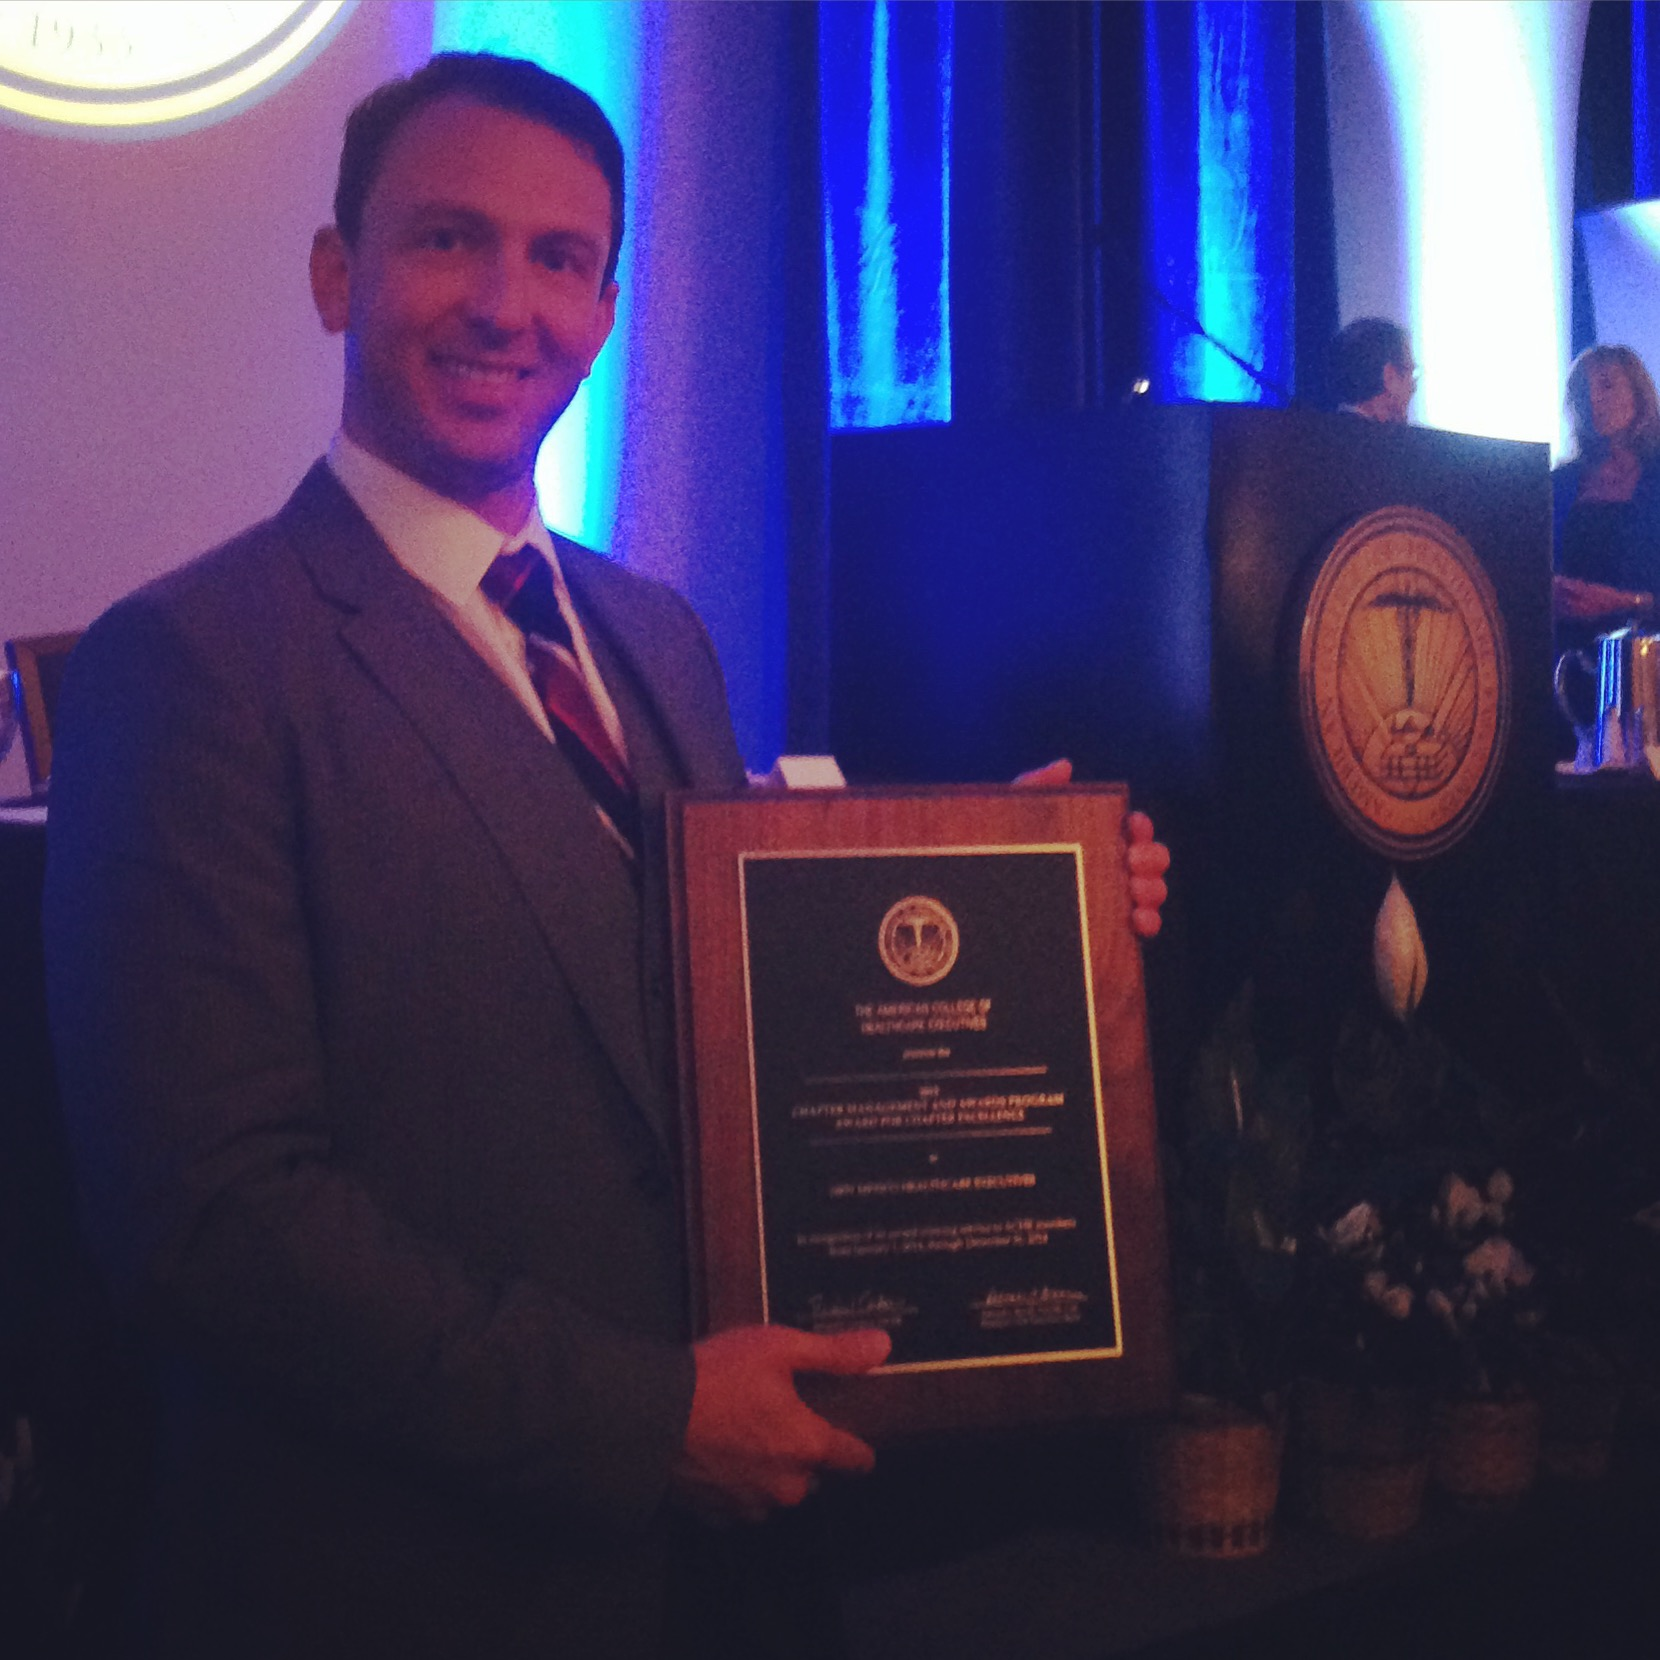 Congratulations for achieving Fellow status, Michael Ell!